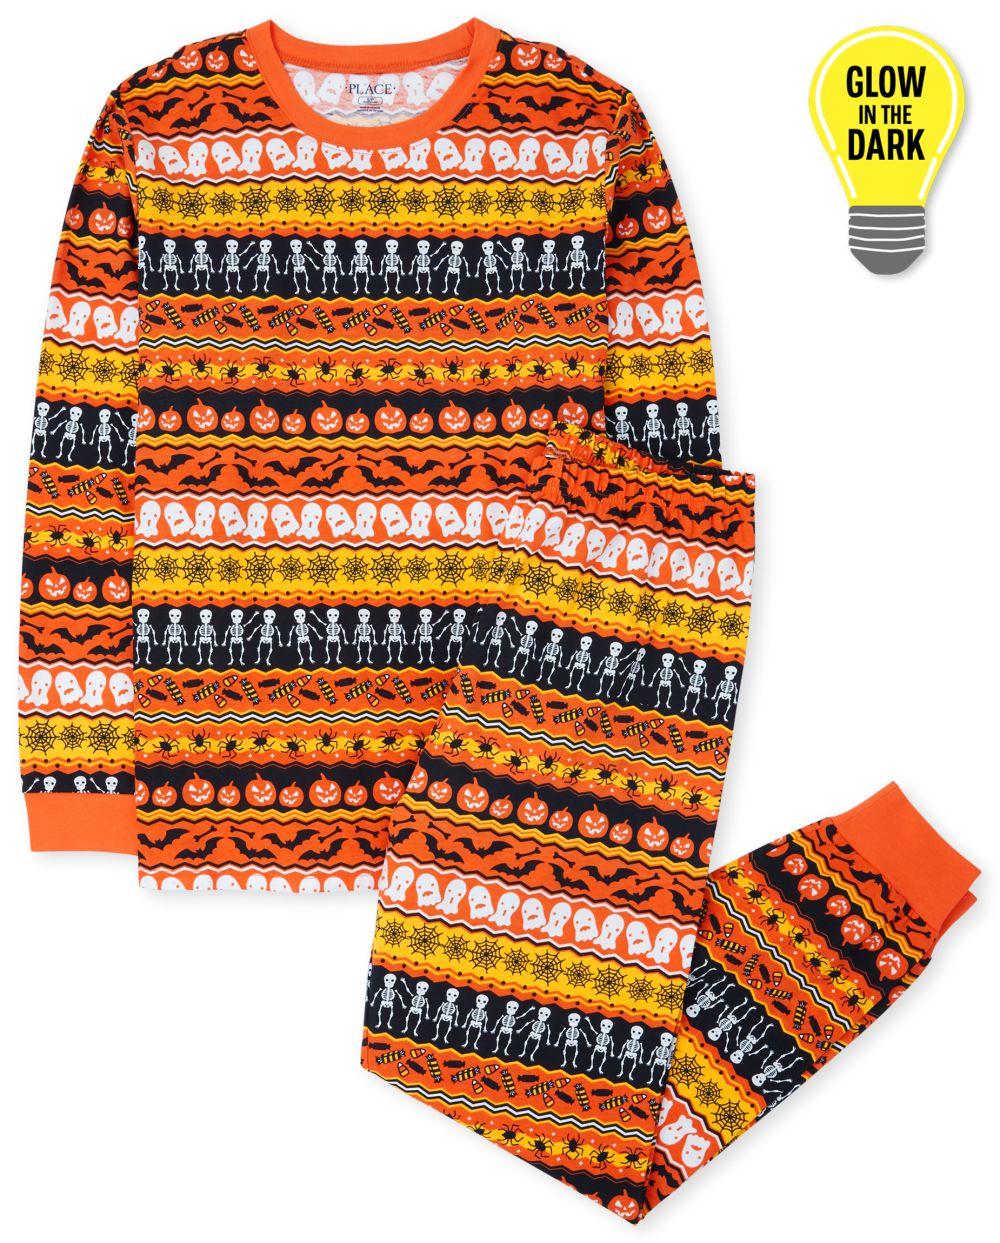 Unisex Adult Matching Family Glow Halloween Fairisle Cotton Pajamas - Black